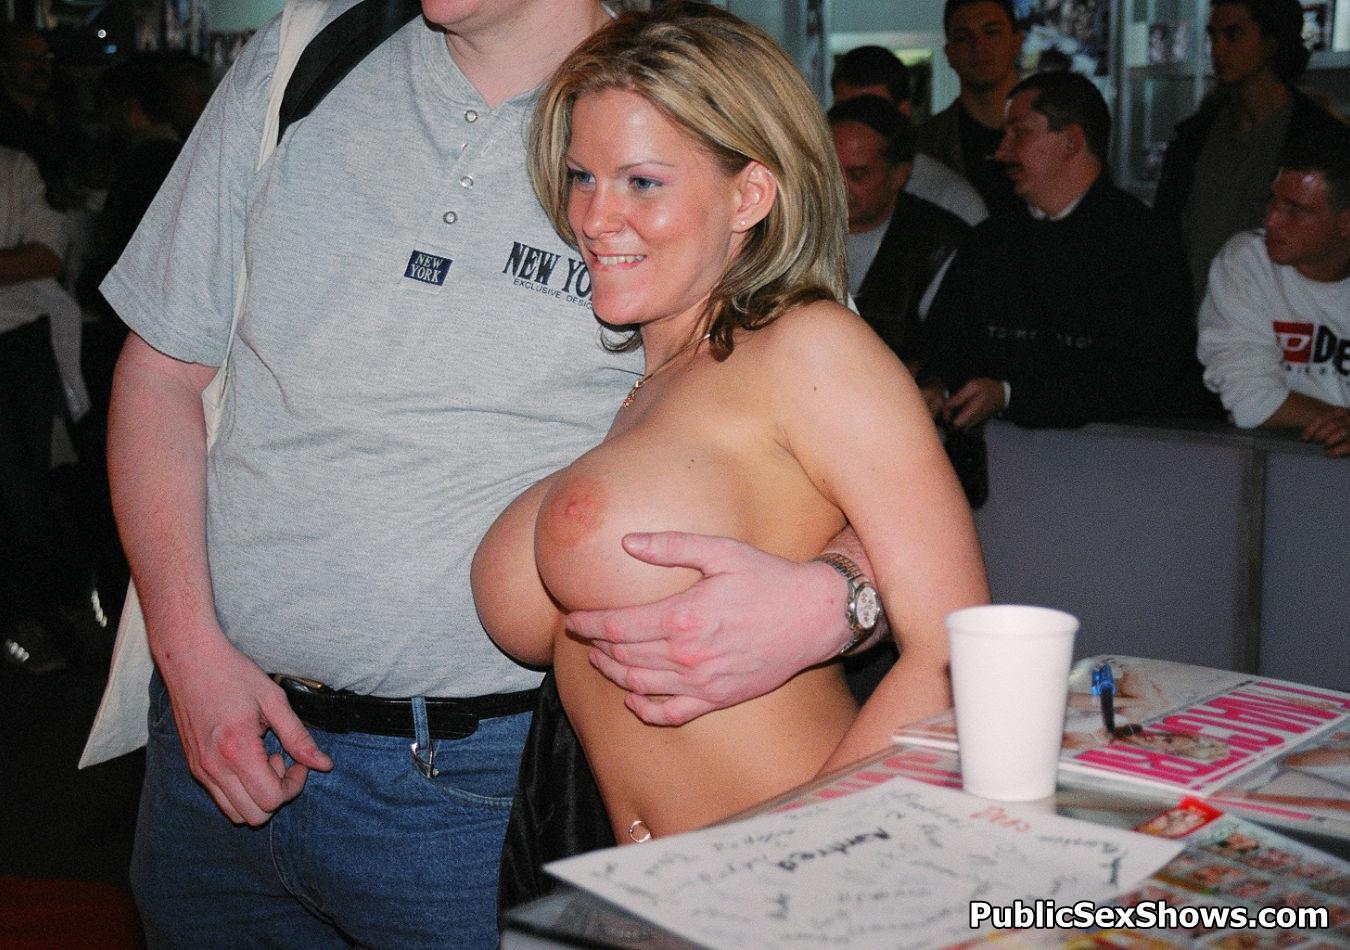 milf im swingerclub sperma auf brüste